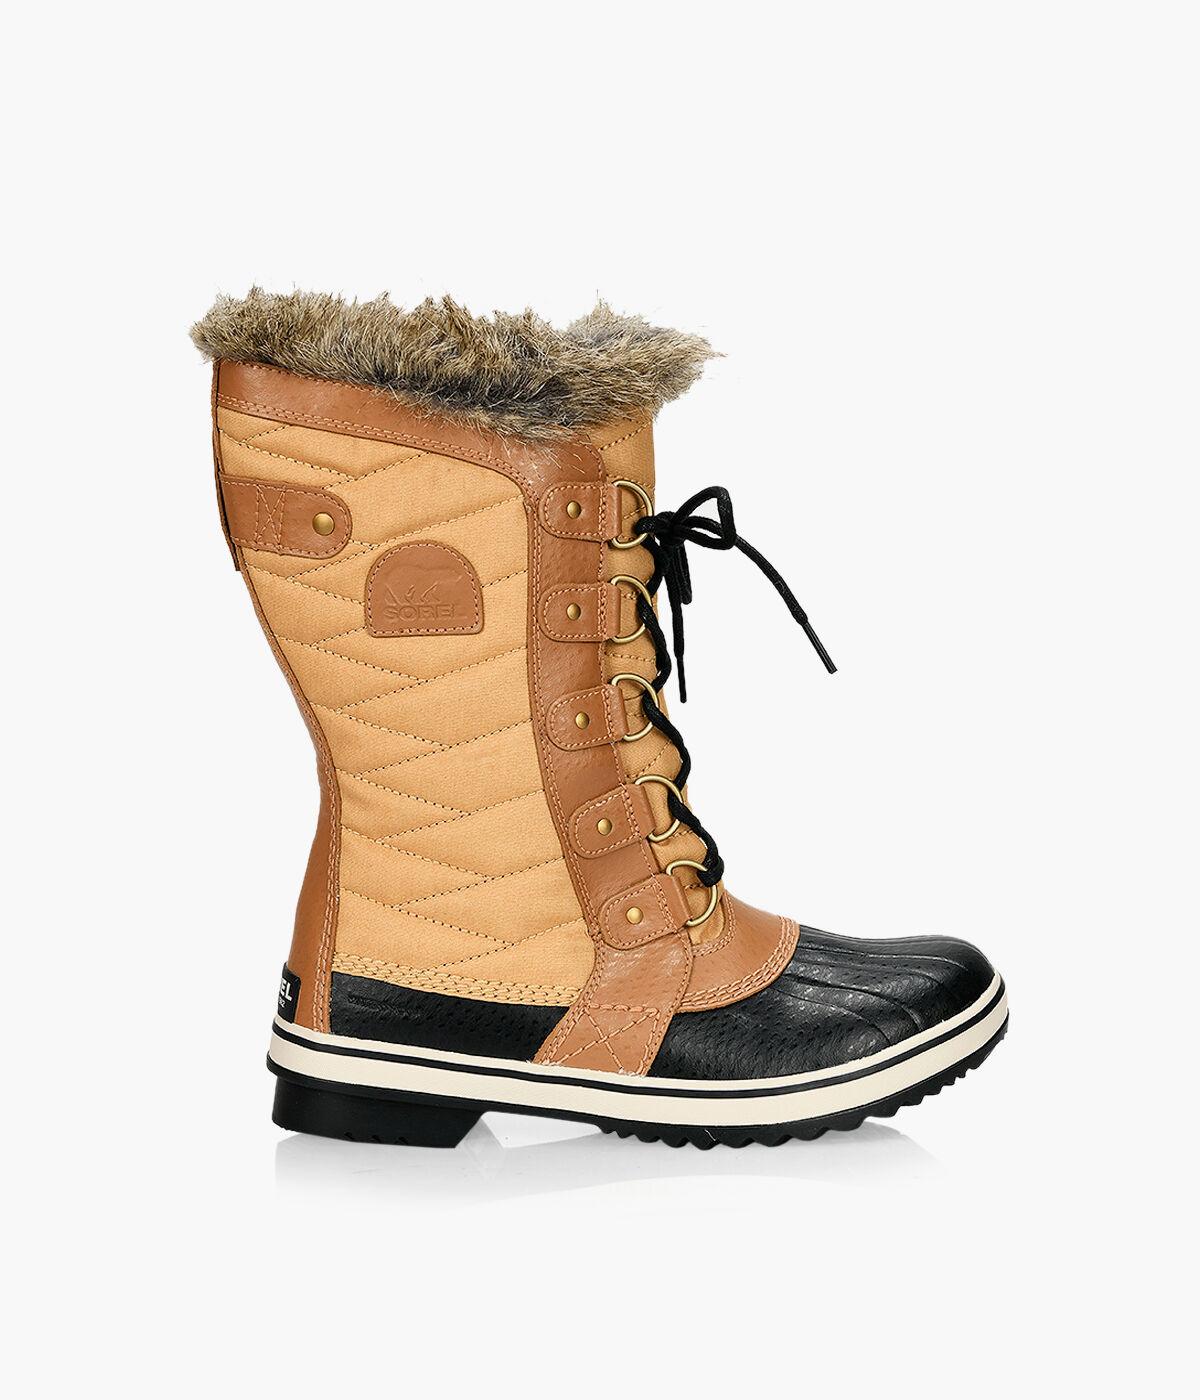 SOREL TOFINO II - Fabric   Browns Shoes